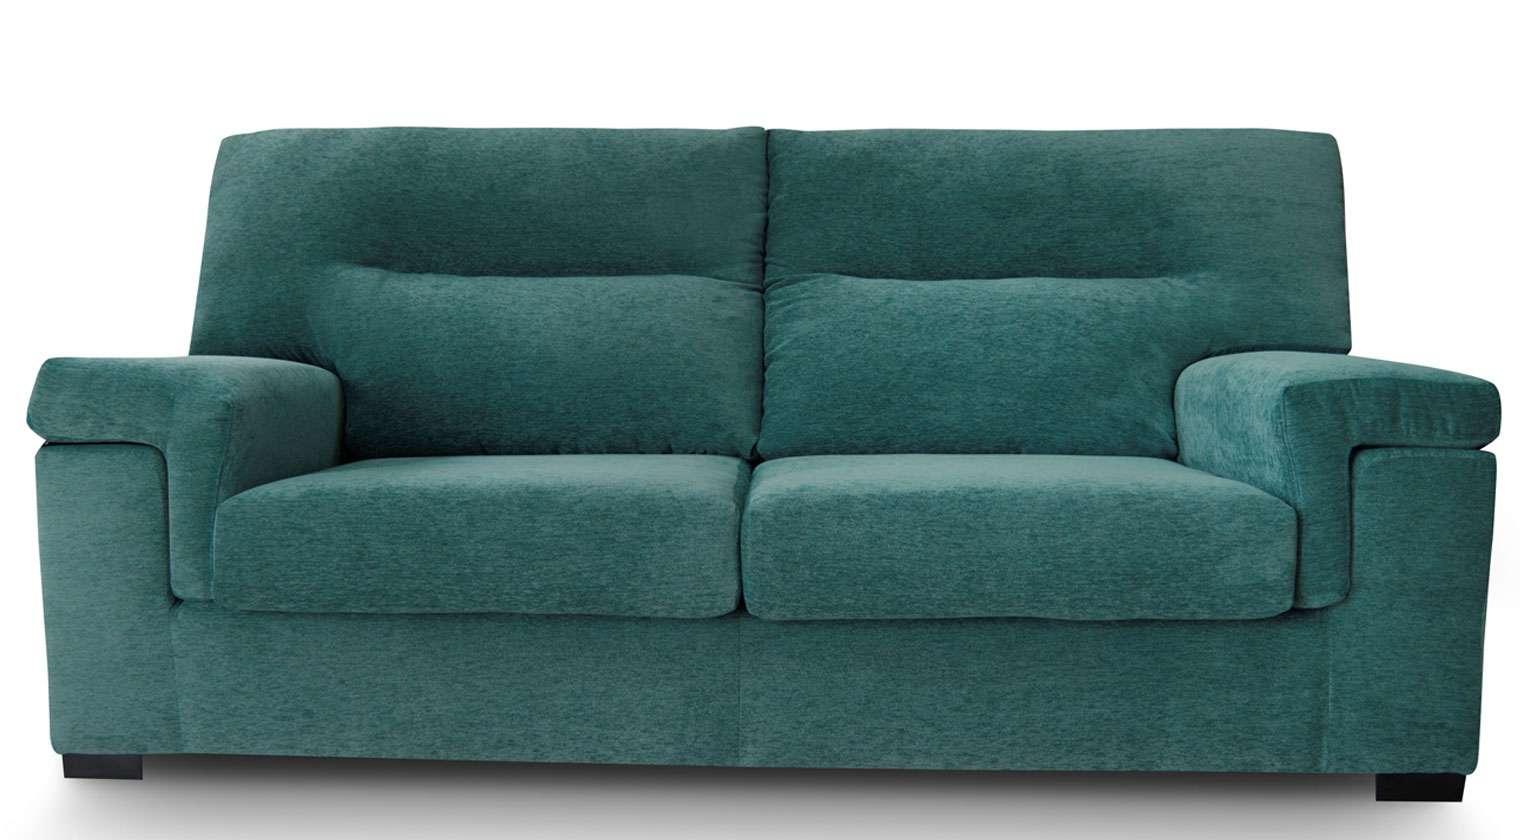 Comprar sof tela okio sof 4 plazas deslizante microfibra - Sofas de microfibra ...